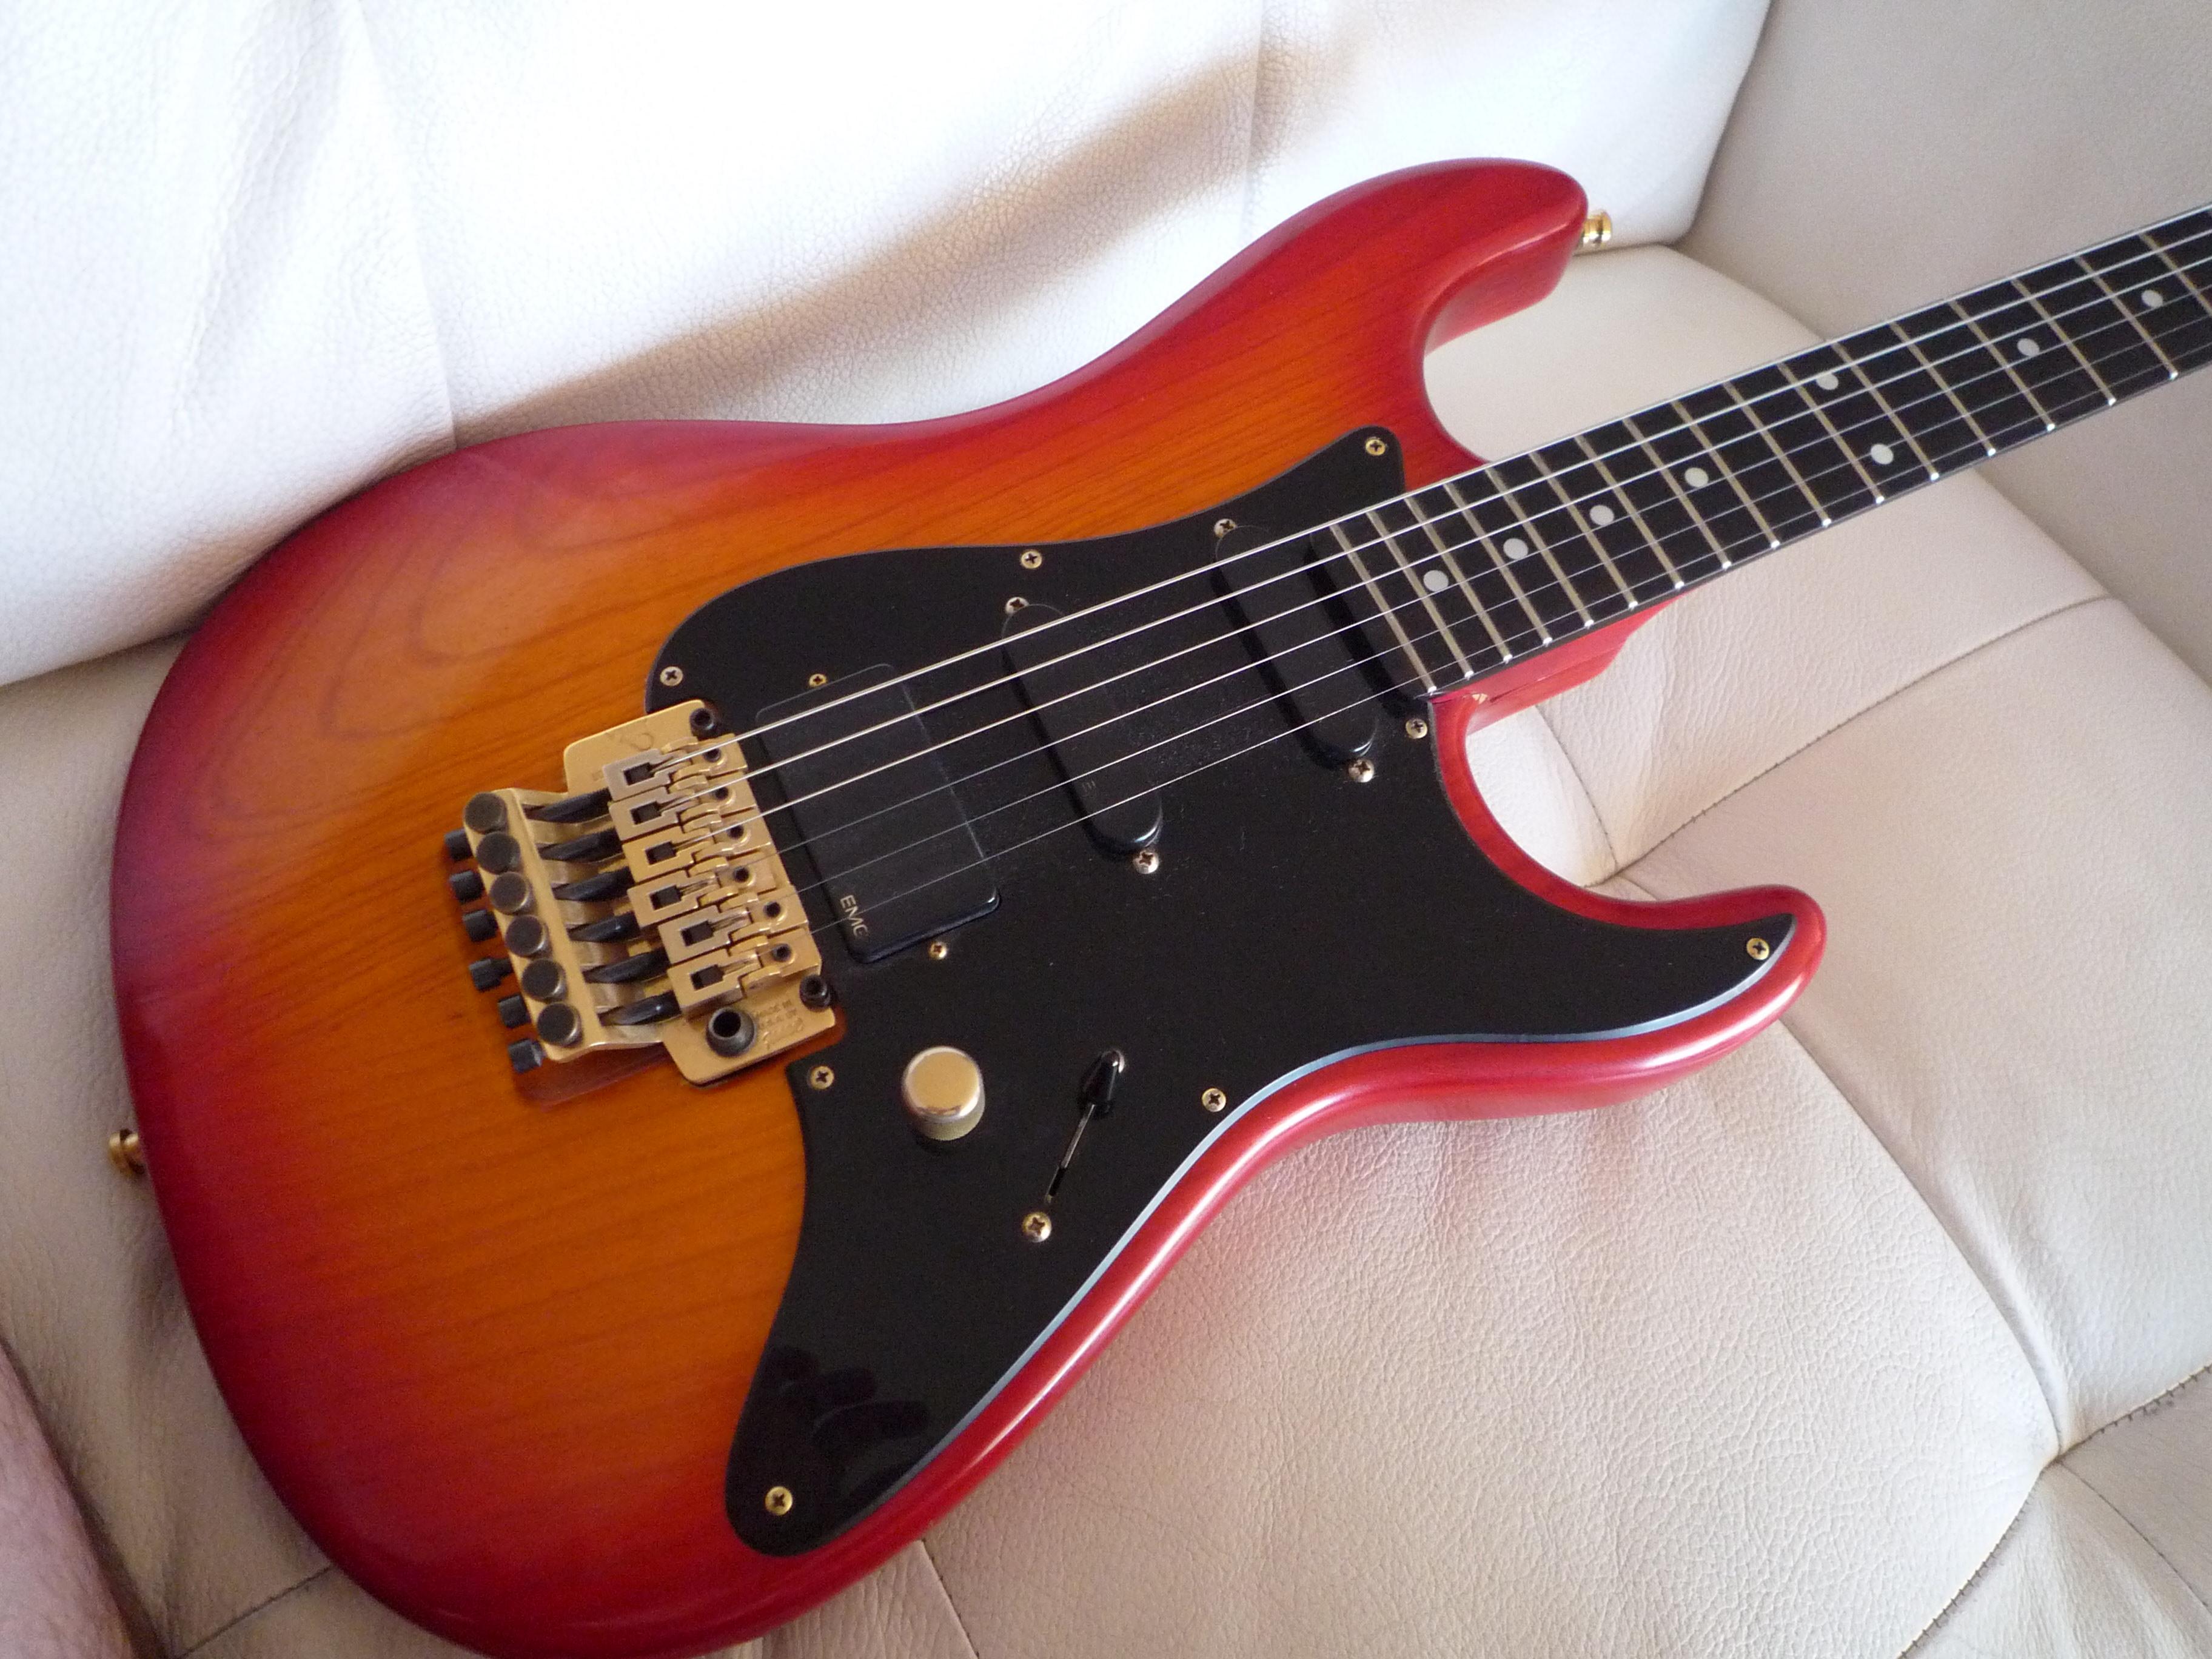 valley arts guitars custom pro usa steve lukather model image 804389 audiofanzine. Black Bedroom Furniture Sets. Home Design Ideas